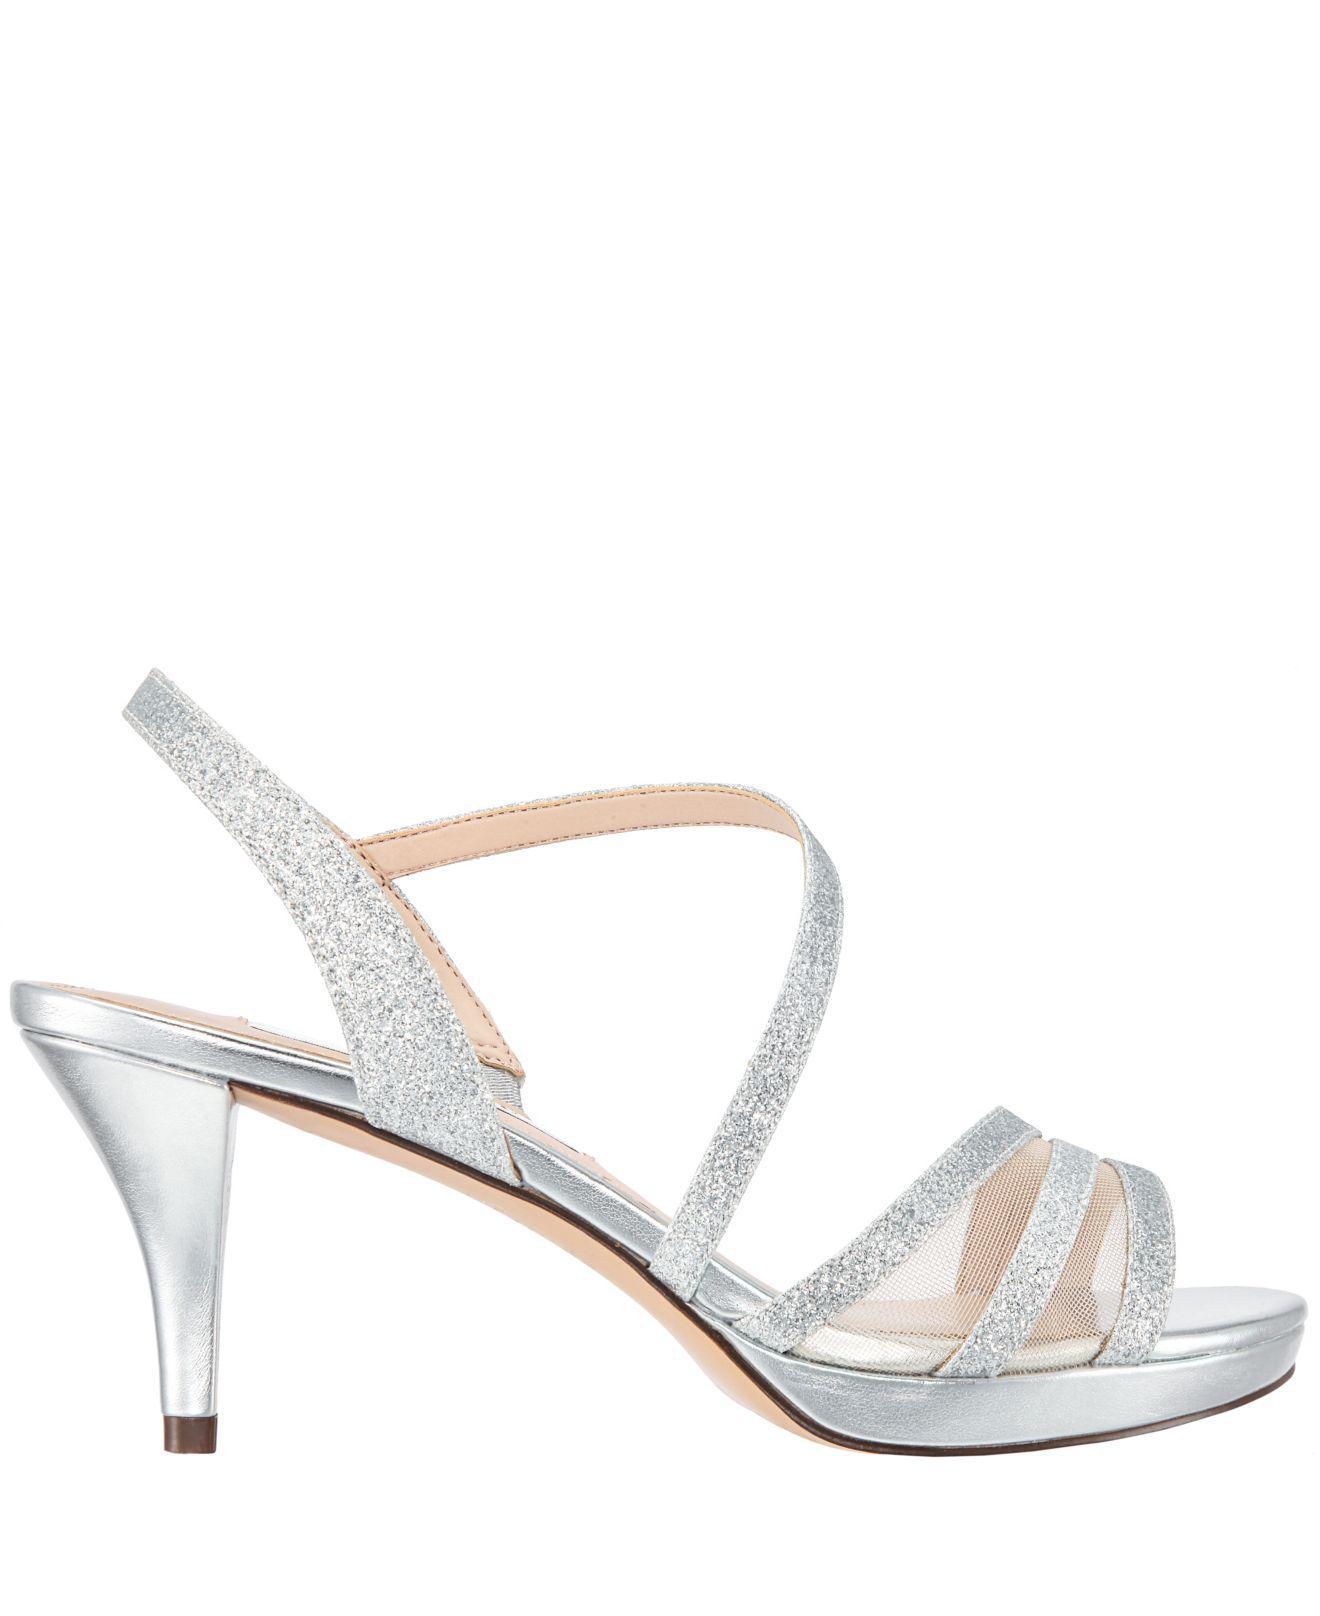 5208bd18d4a Lyst - Nina Nazima Platform Dress Sandals in Metallic